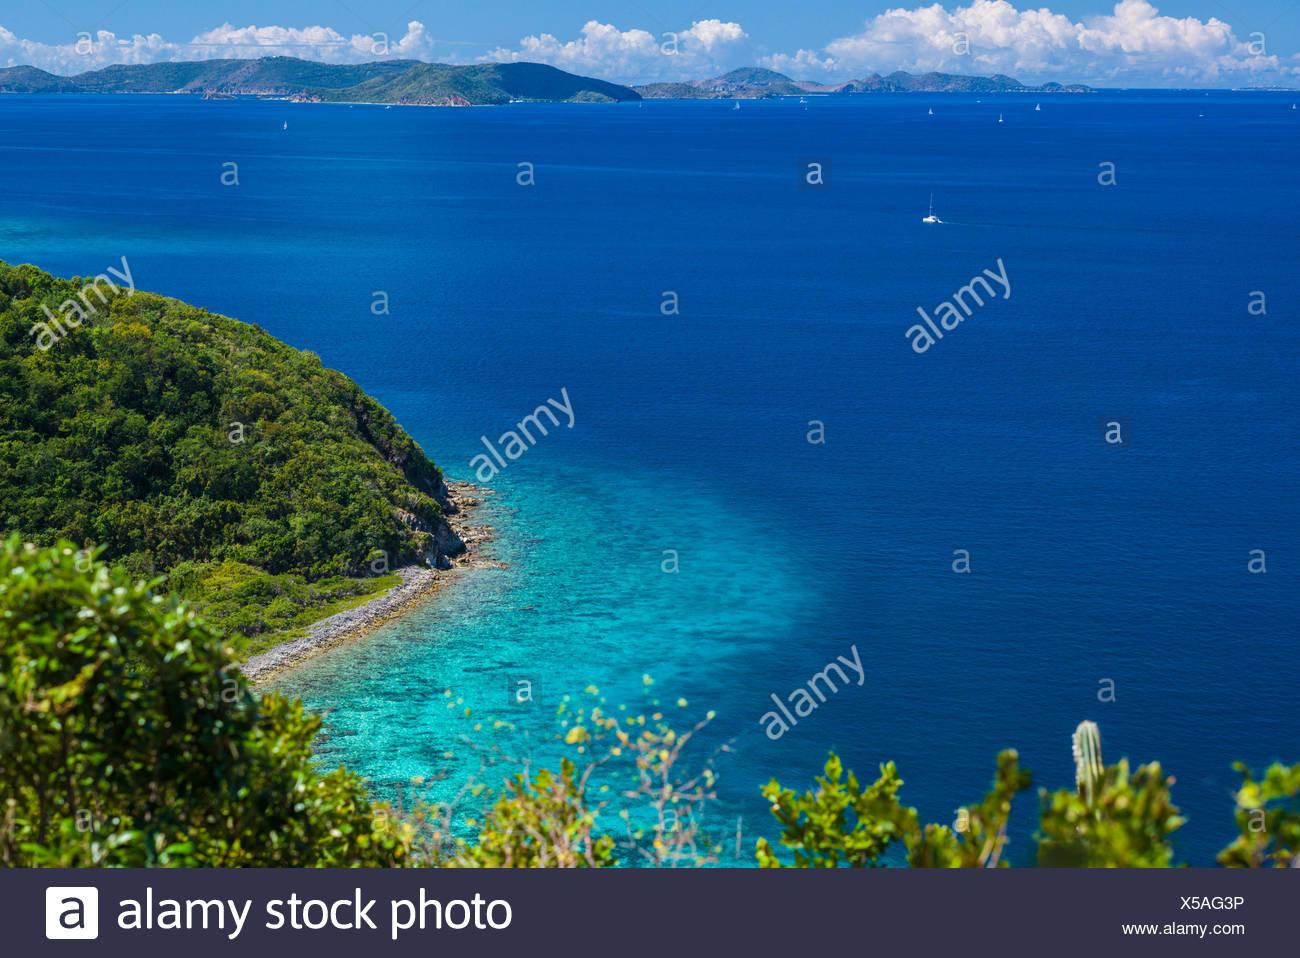 U.S. Virgin Islands, St. John, Friis Bay, waterfront - Stock Image